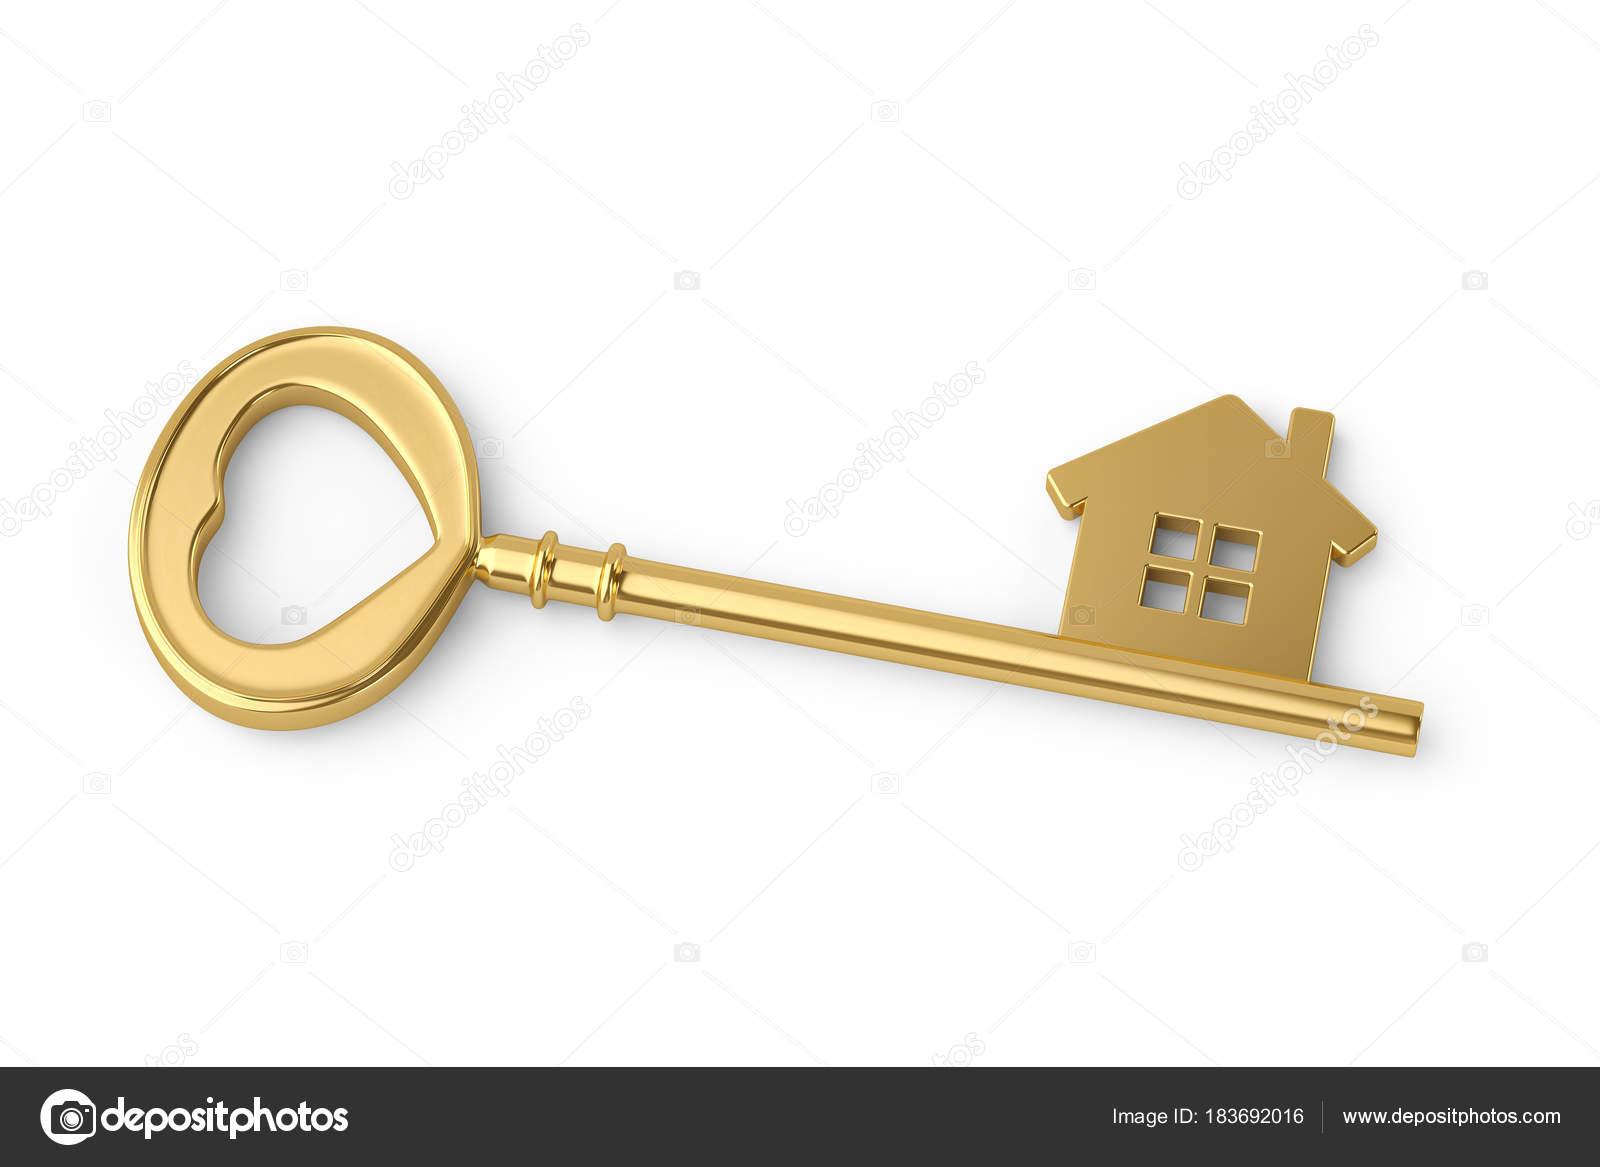 Gold house key on white background3D illustration Stock Photo